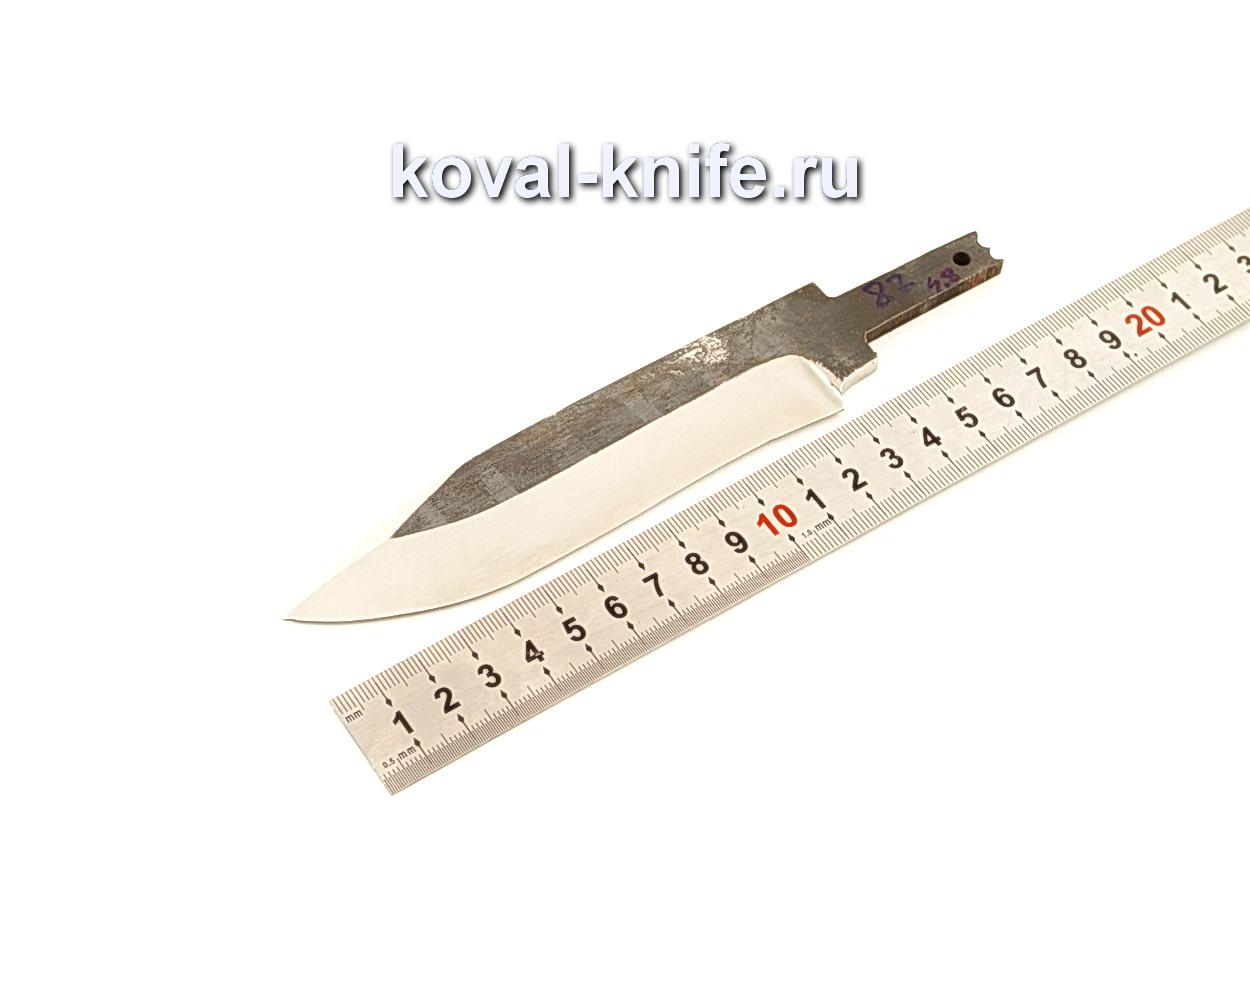 Клинок для ножа из кованой 110Х18 МШД N82